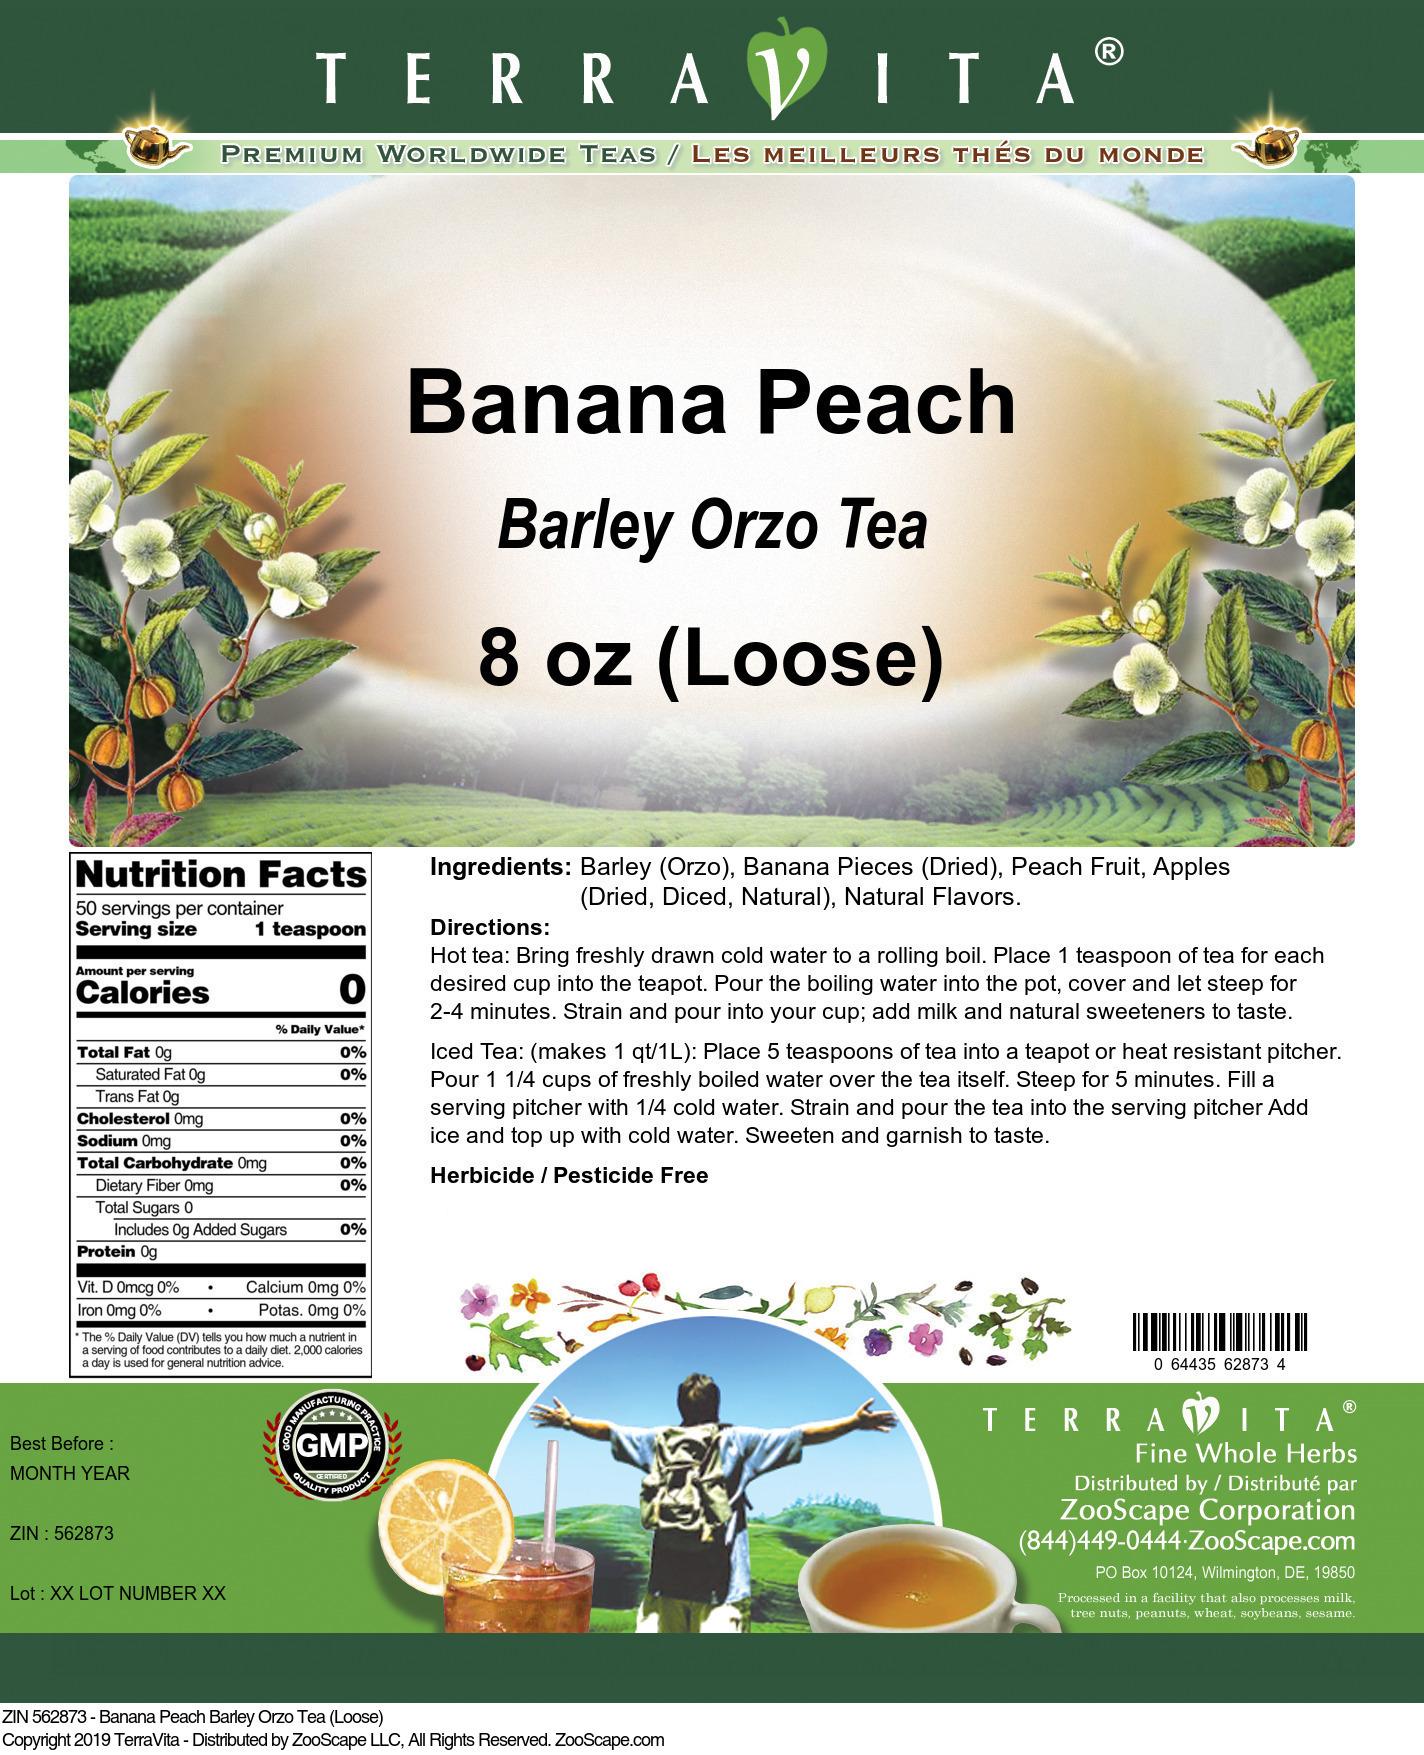 Banana Peach Barley Orzo